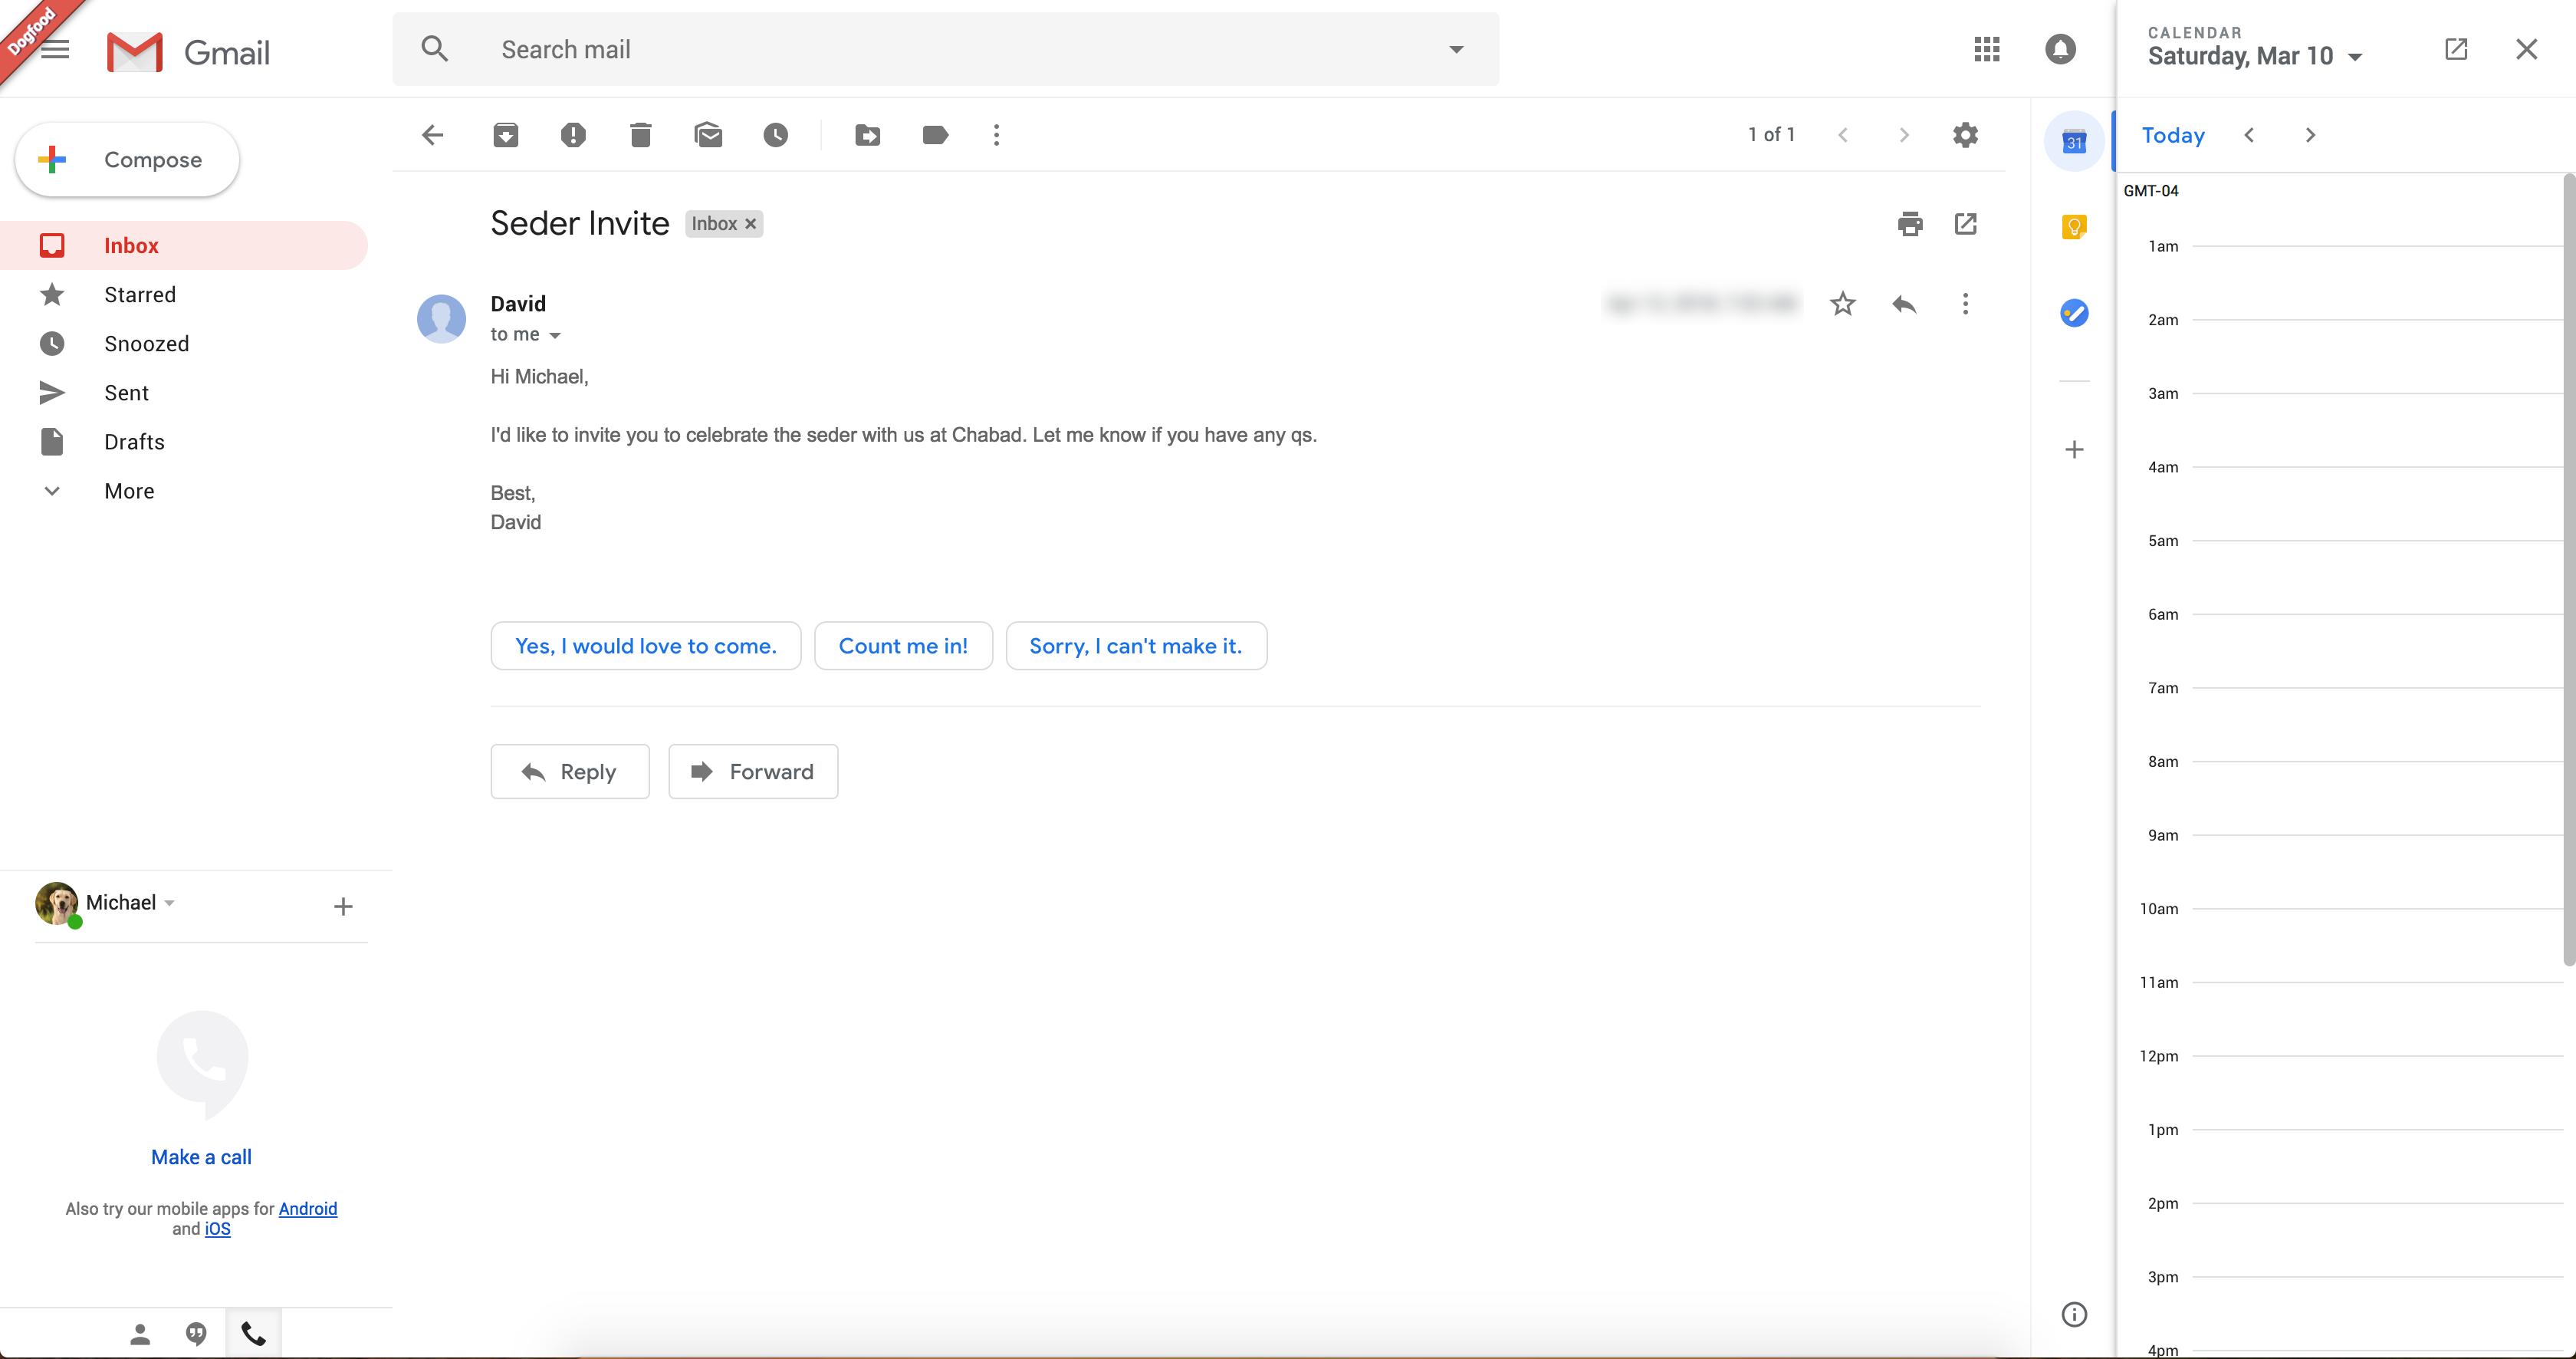 Gmail Software - Gmail schedule calendar